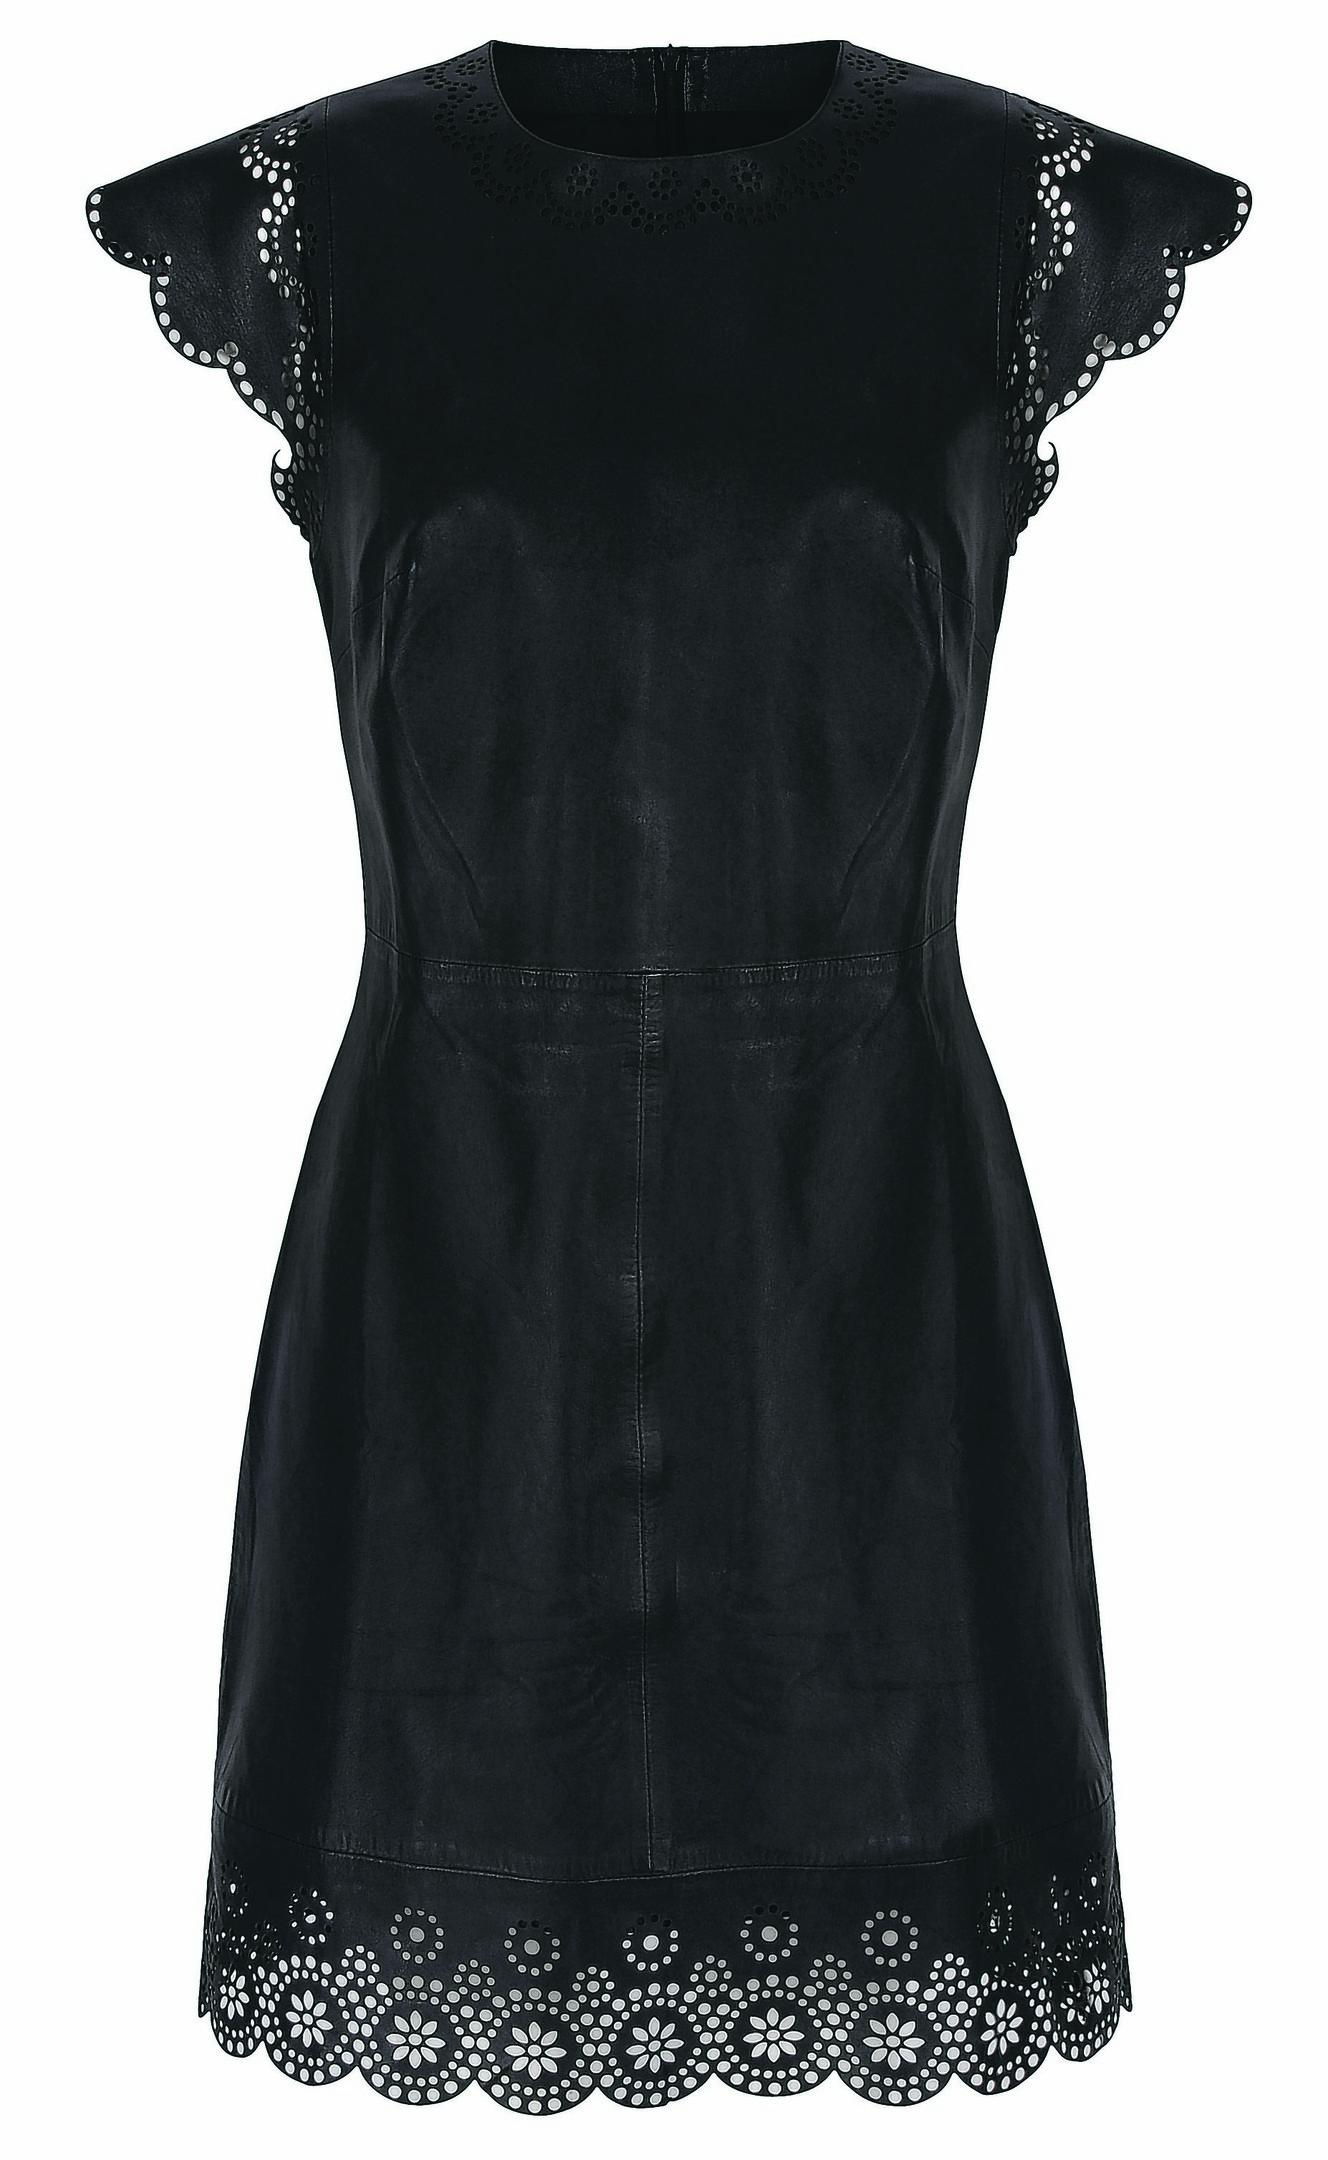 Dickins & Jones Cap Sleeve Leather Dress, House of Fraser